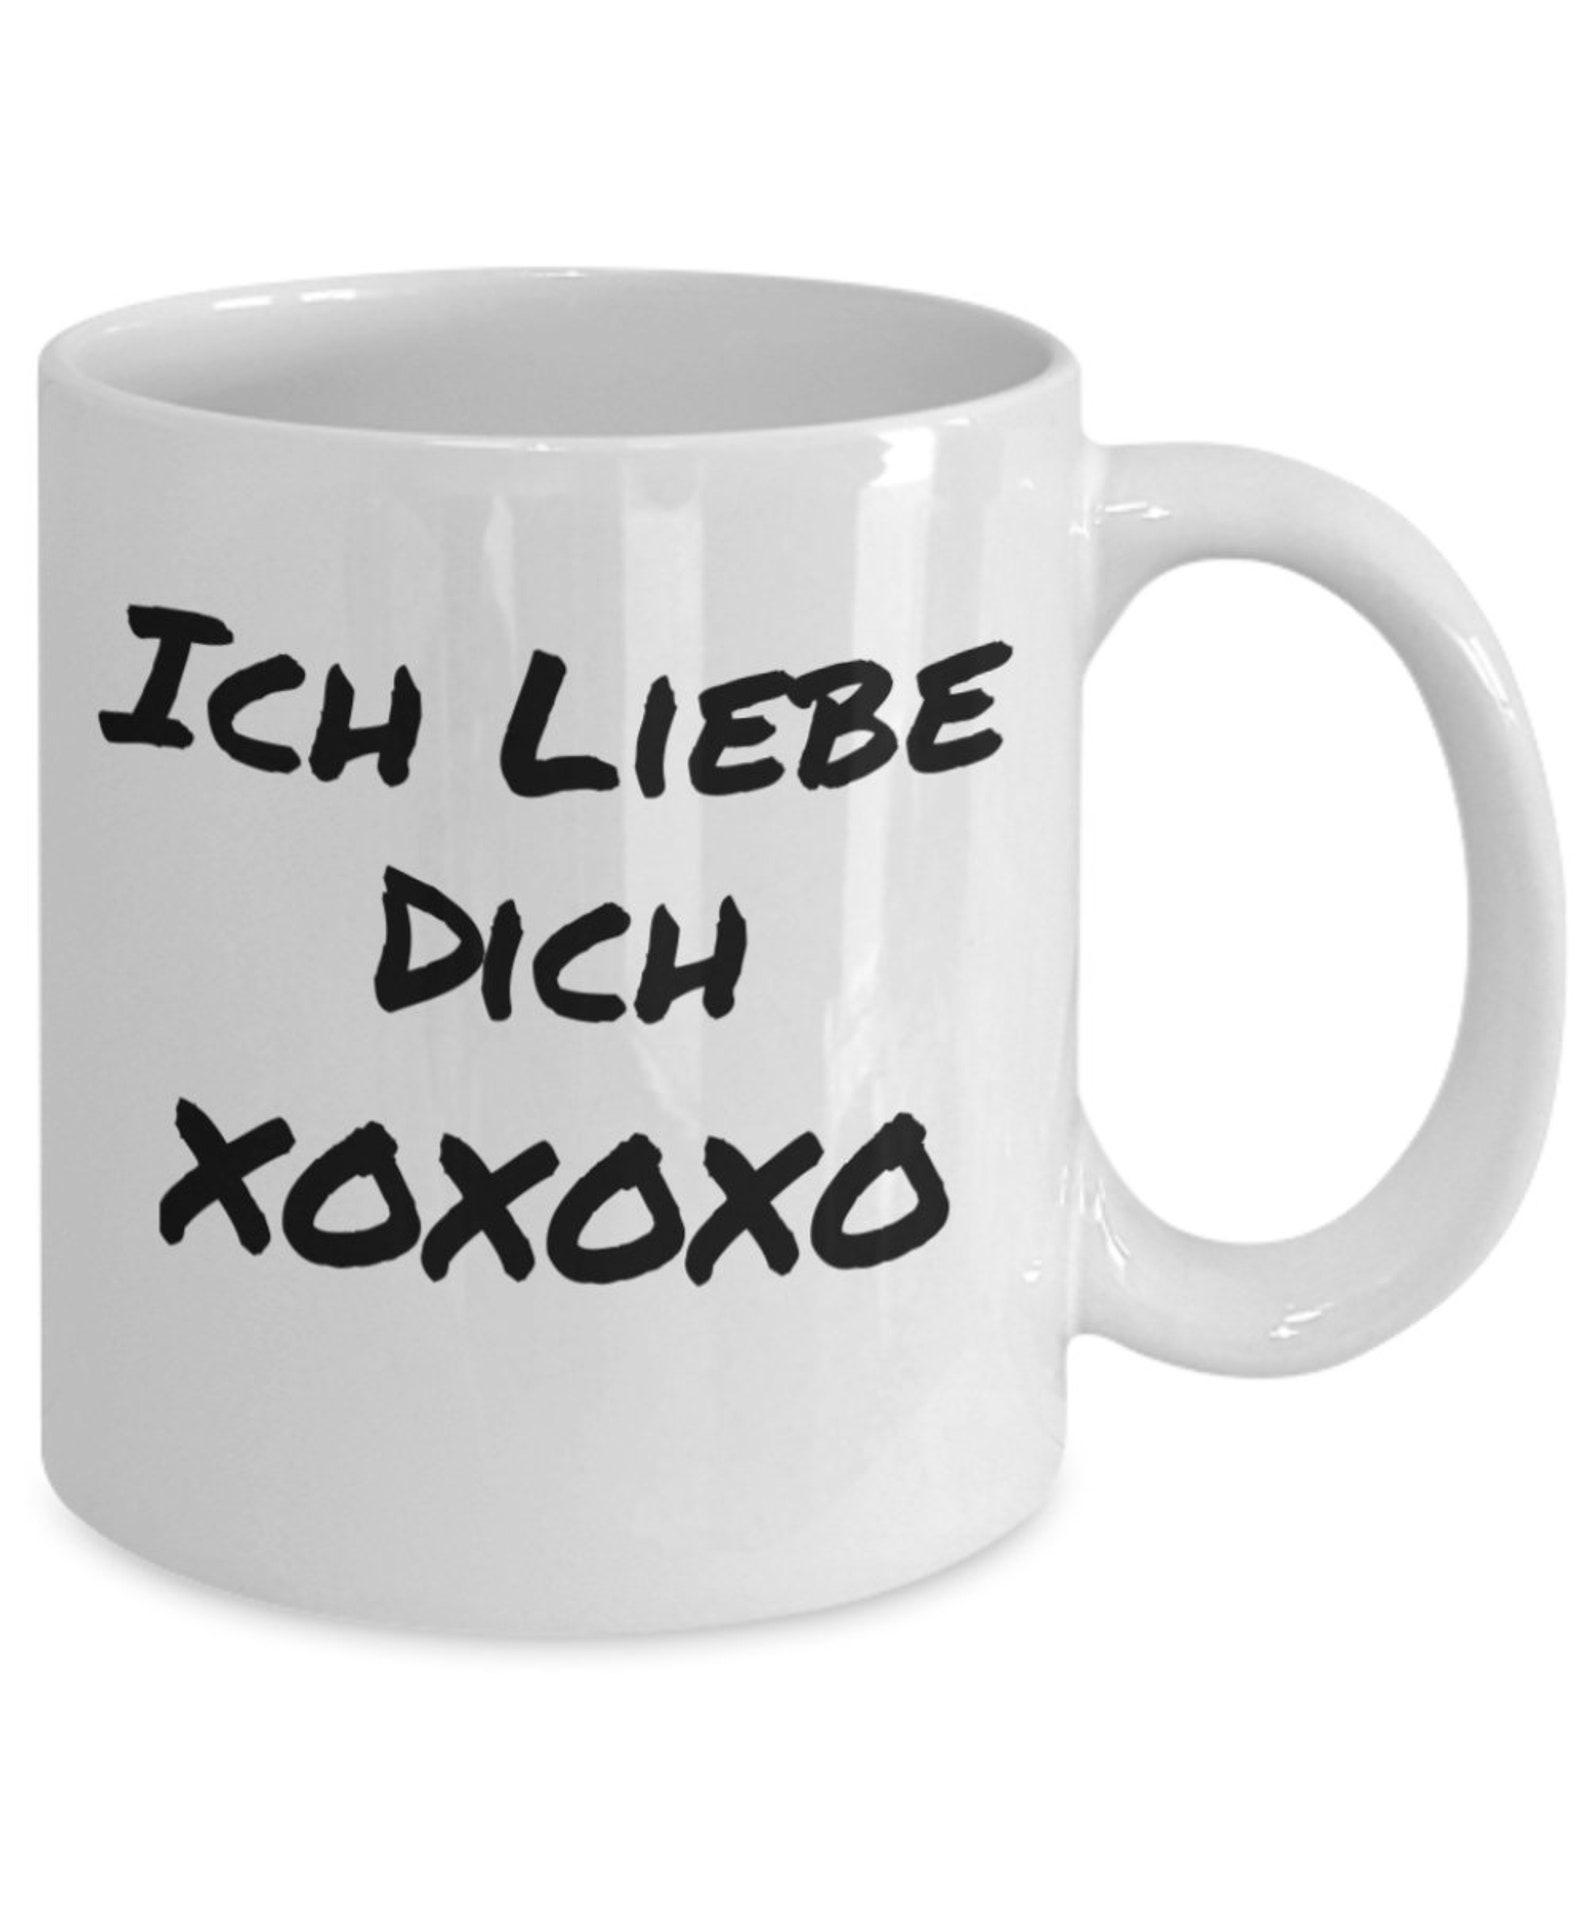 Mikabel ich liebe dich german love you valentine funny 11 oz coffee mug cup